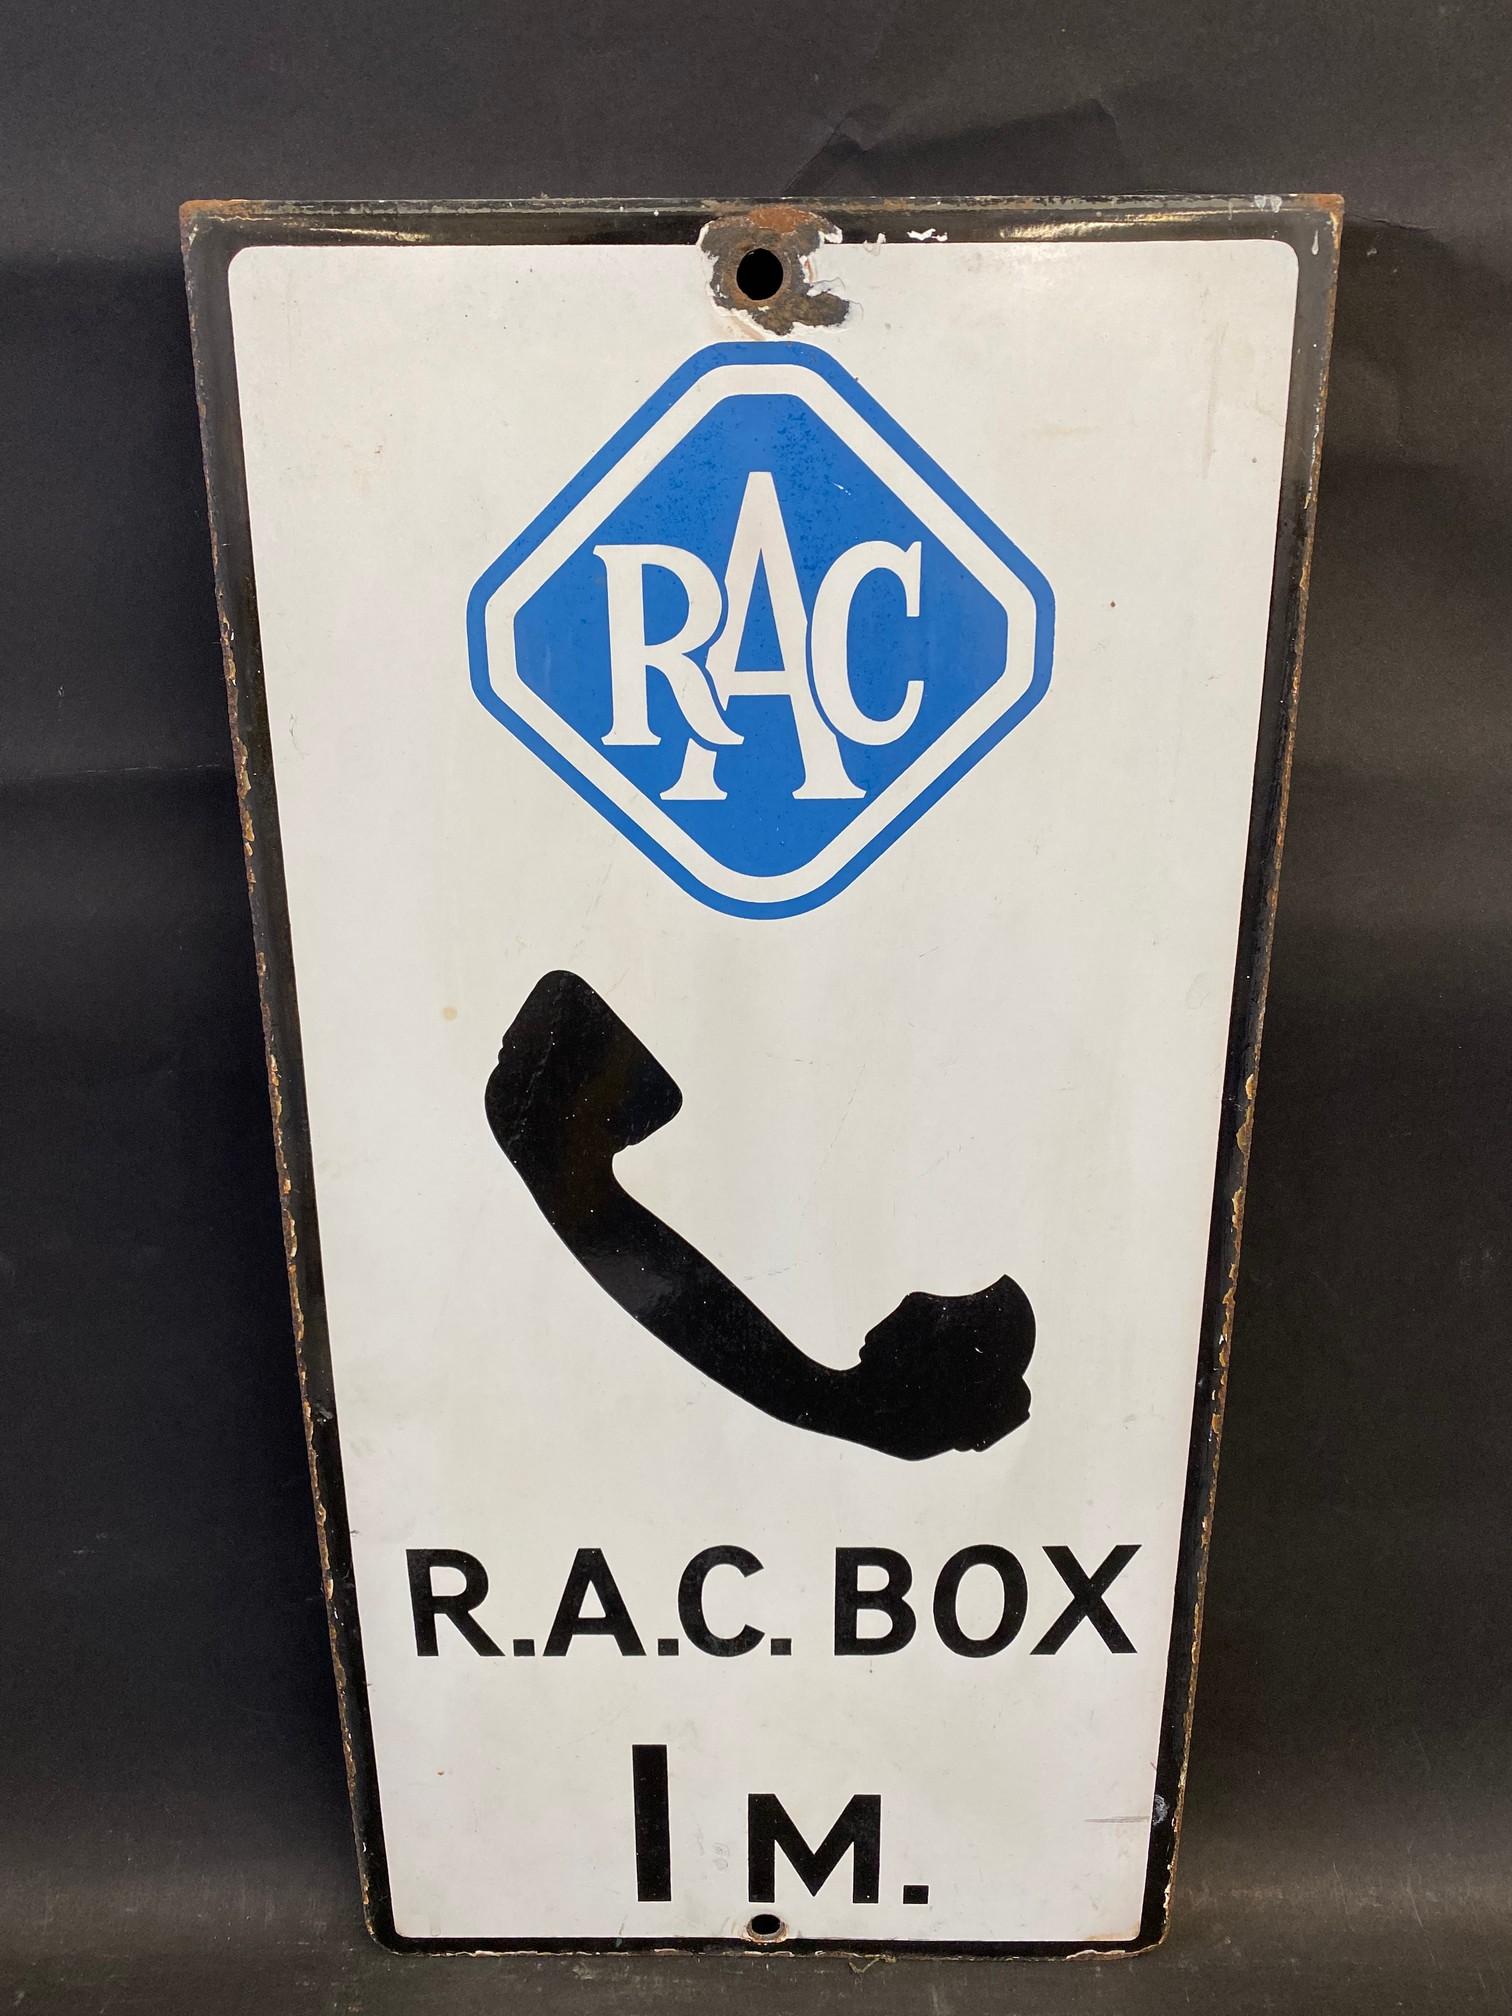 "An RAC Box 1 mile rectangular enamel sign, 10 x 20""."